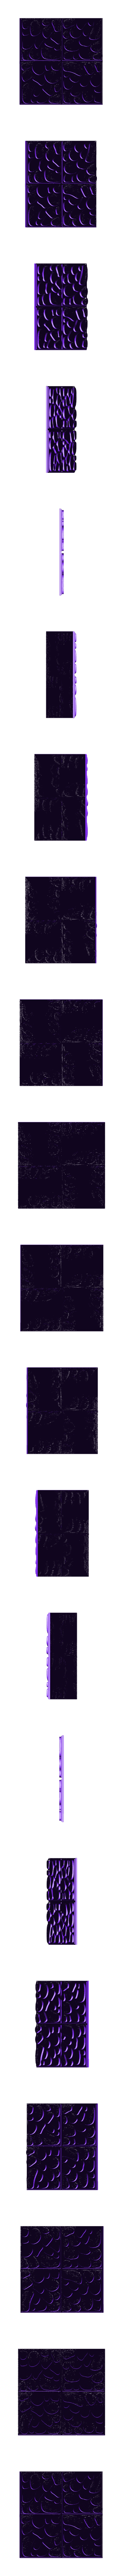 Finalized_Floor.stl Download STL file GeneriTiles - Tabletop RPG Tileset • 3D printable object, daandruff